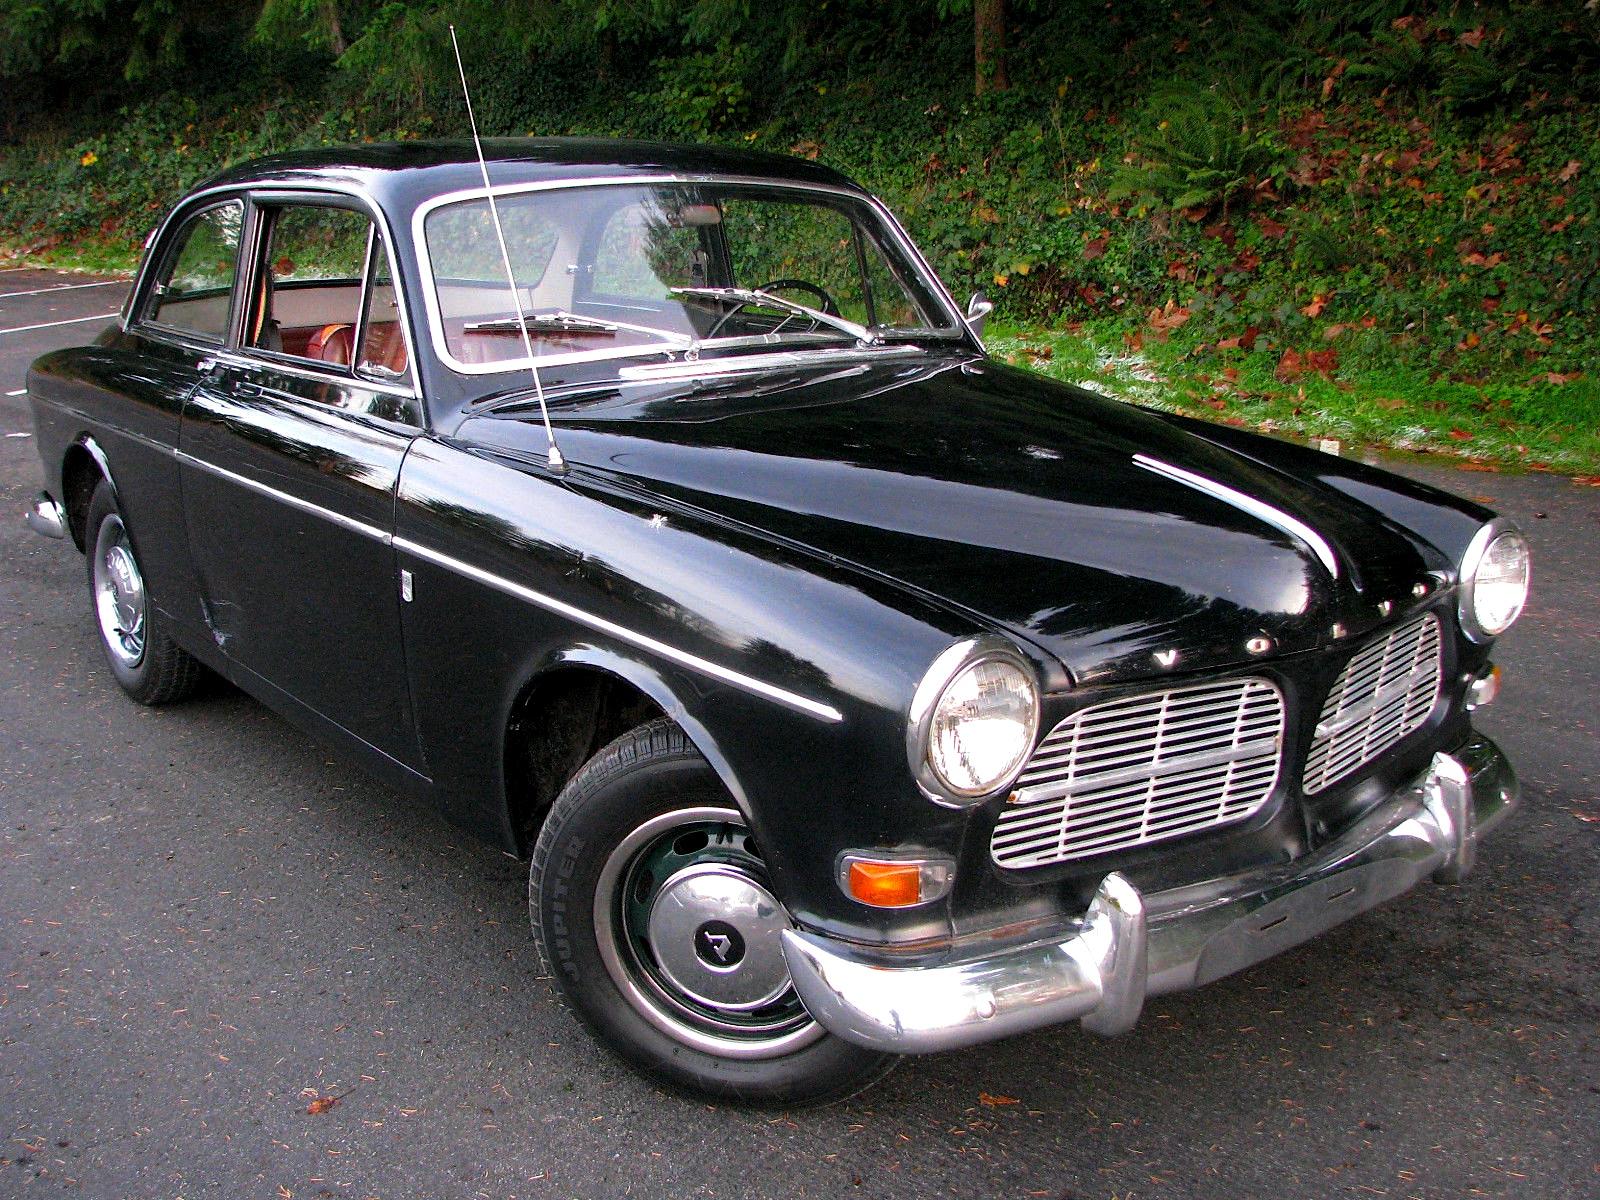 Black beauty: '65 Volvo 122S | Mint2Me